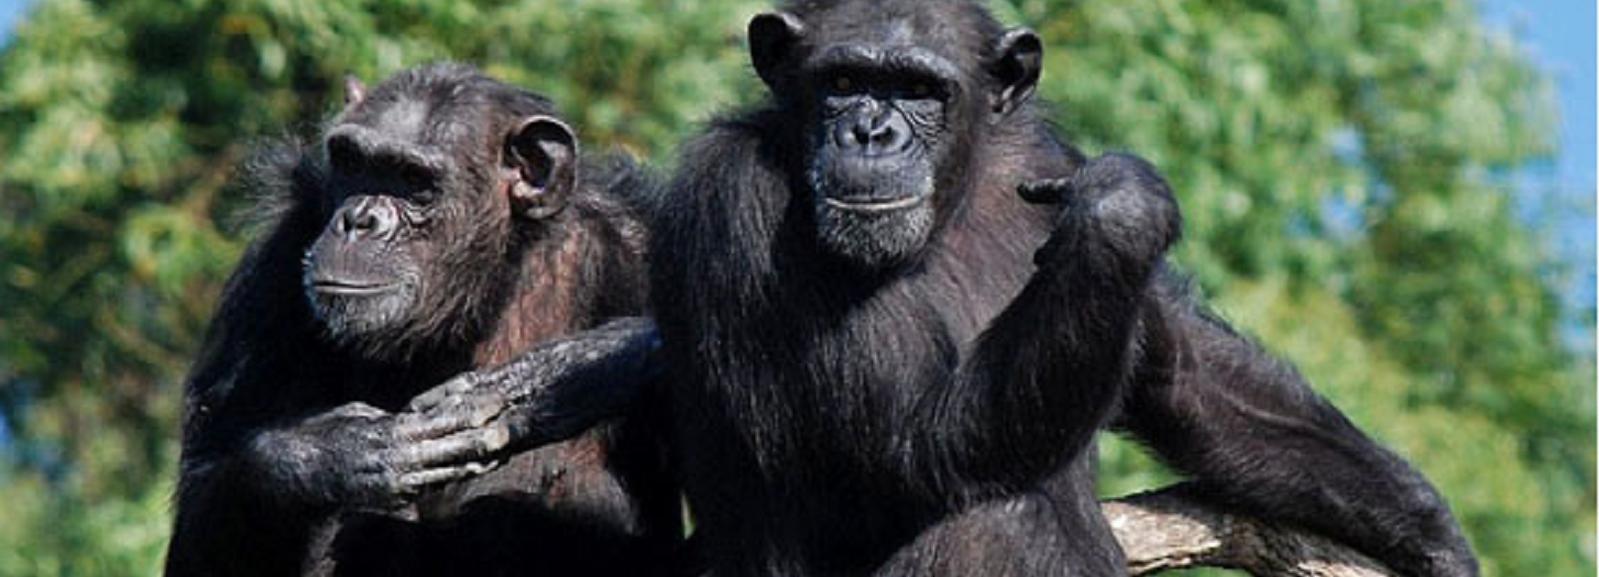 Nelspruit: Chimp Eden und Sudwala Caves Experience